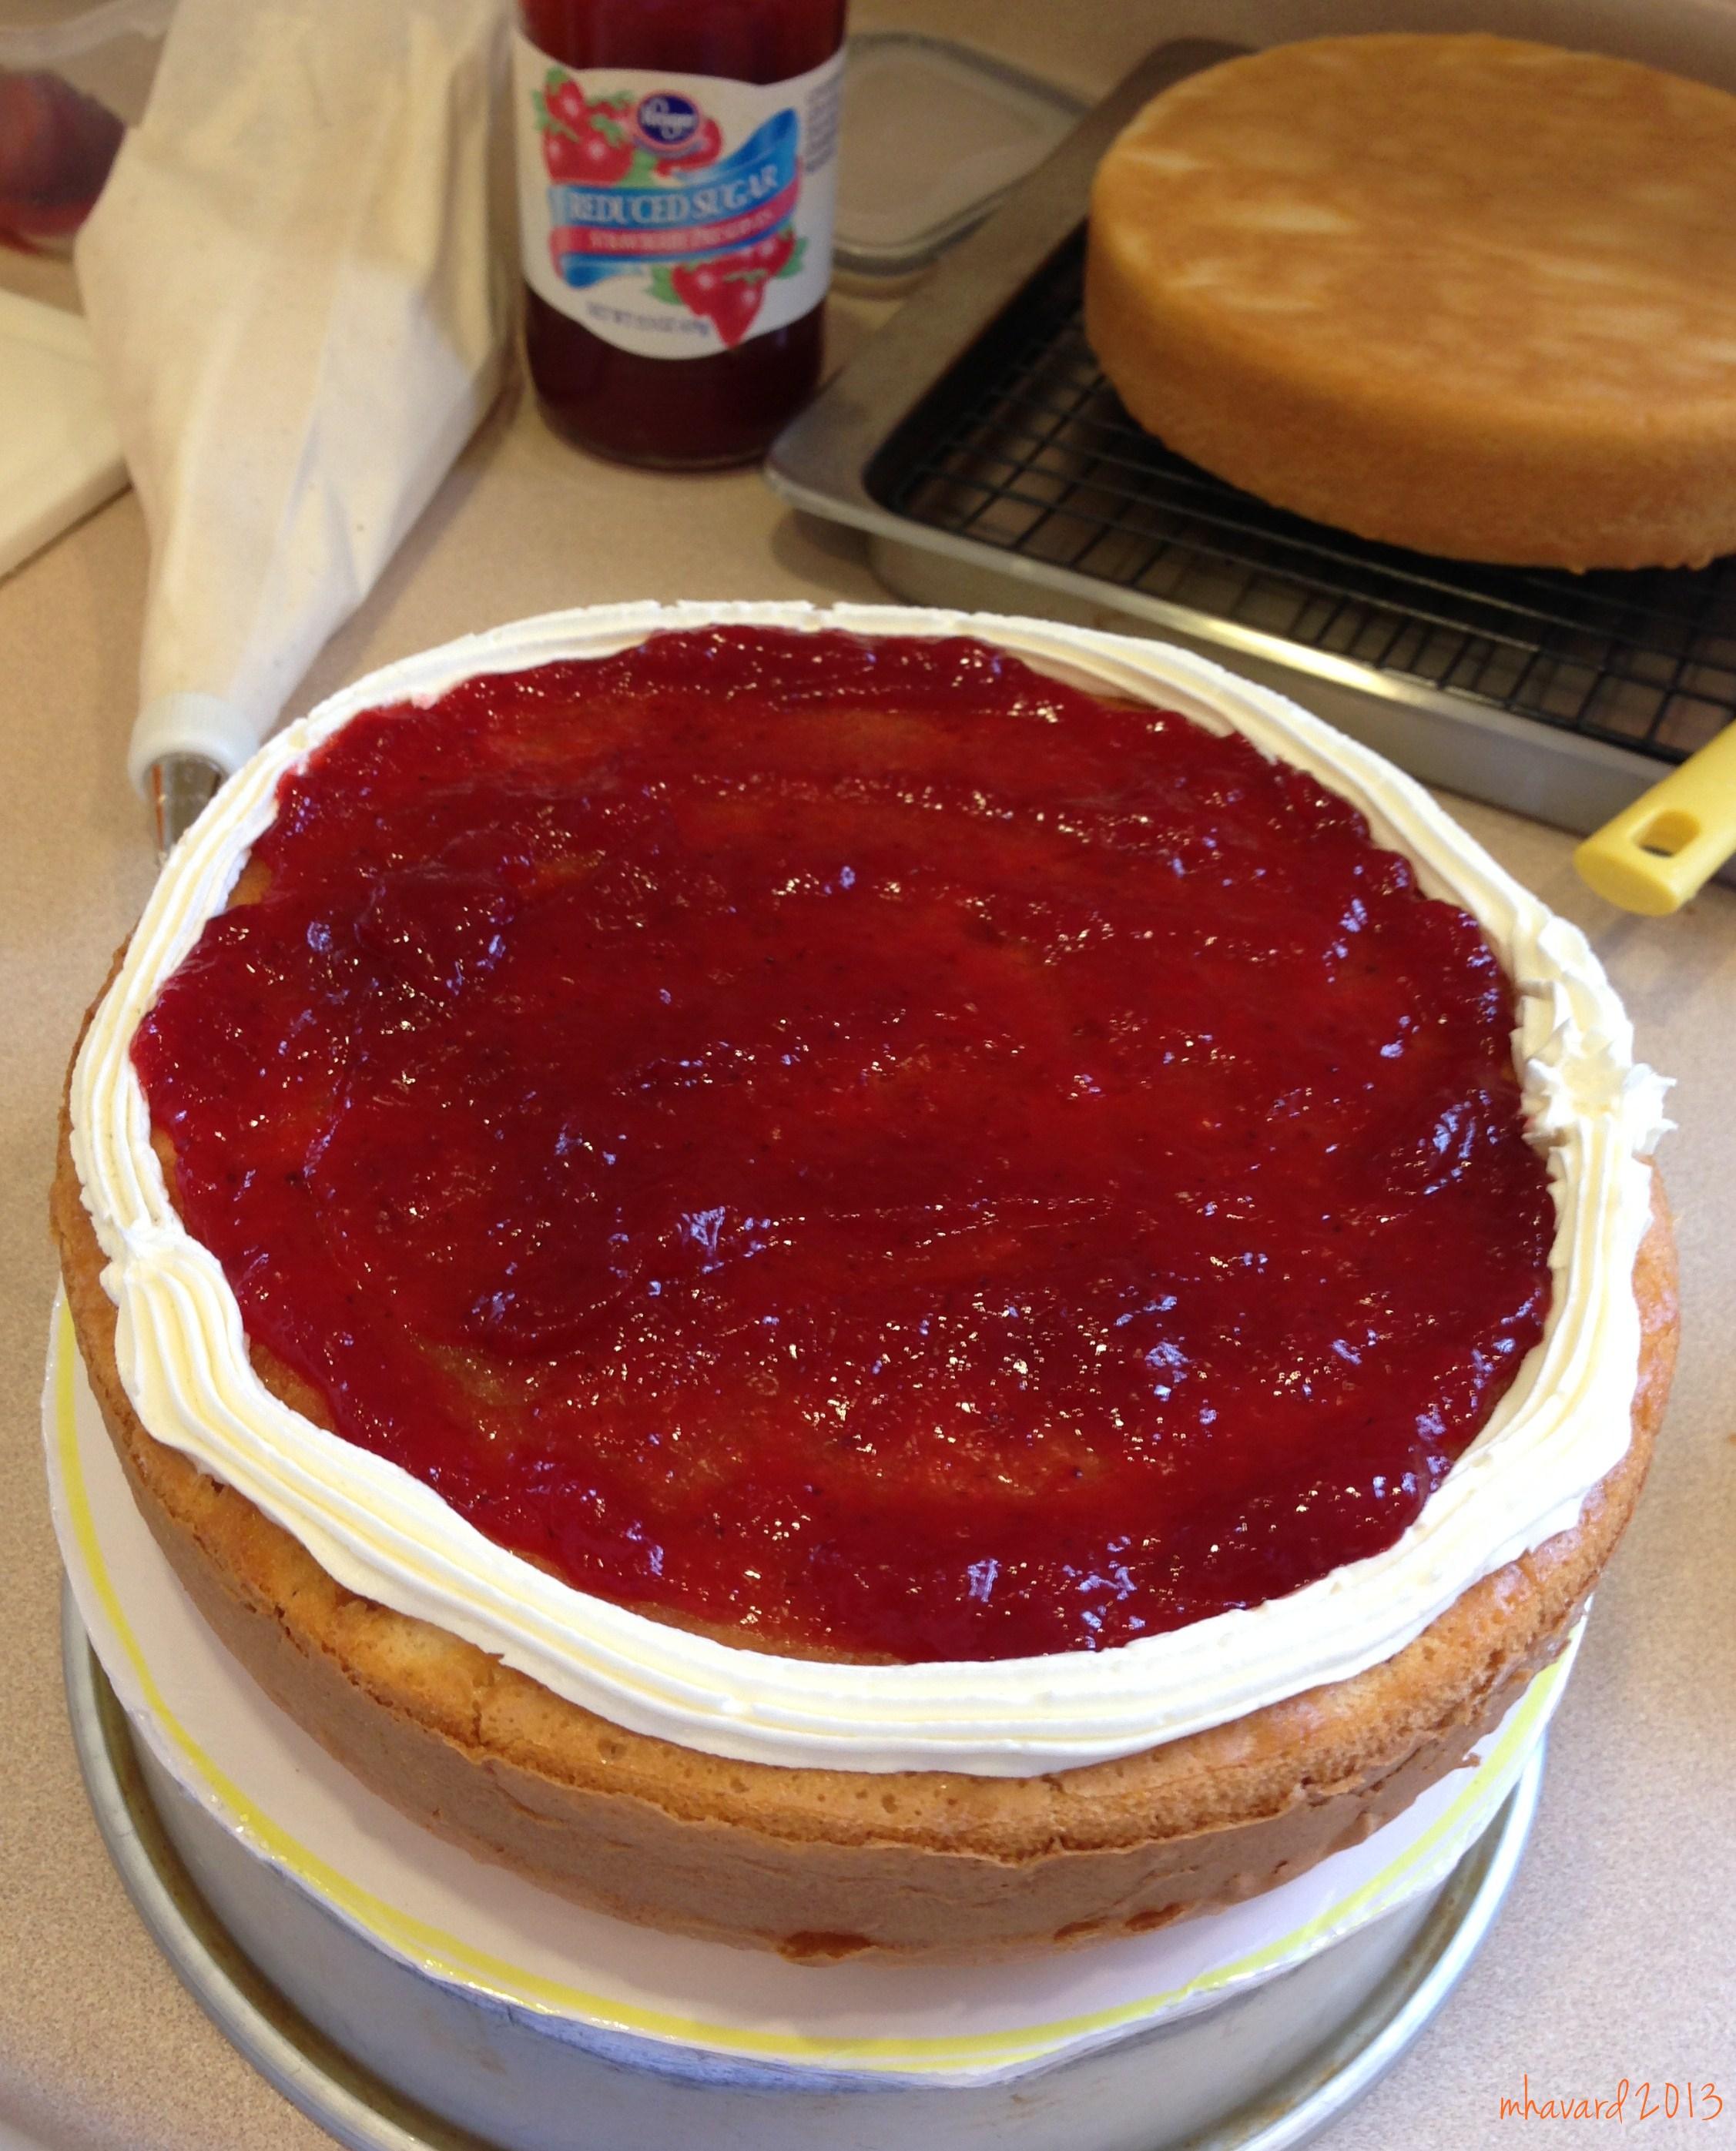 strawberry preserves cake filling